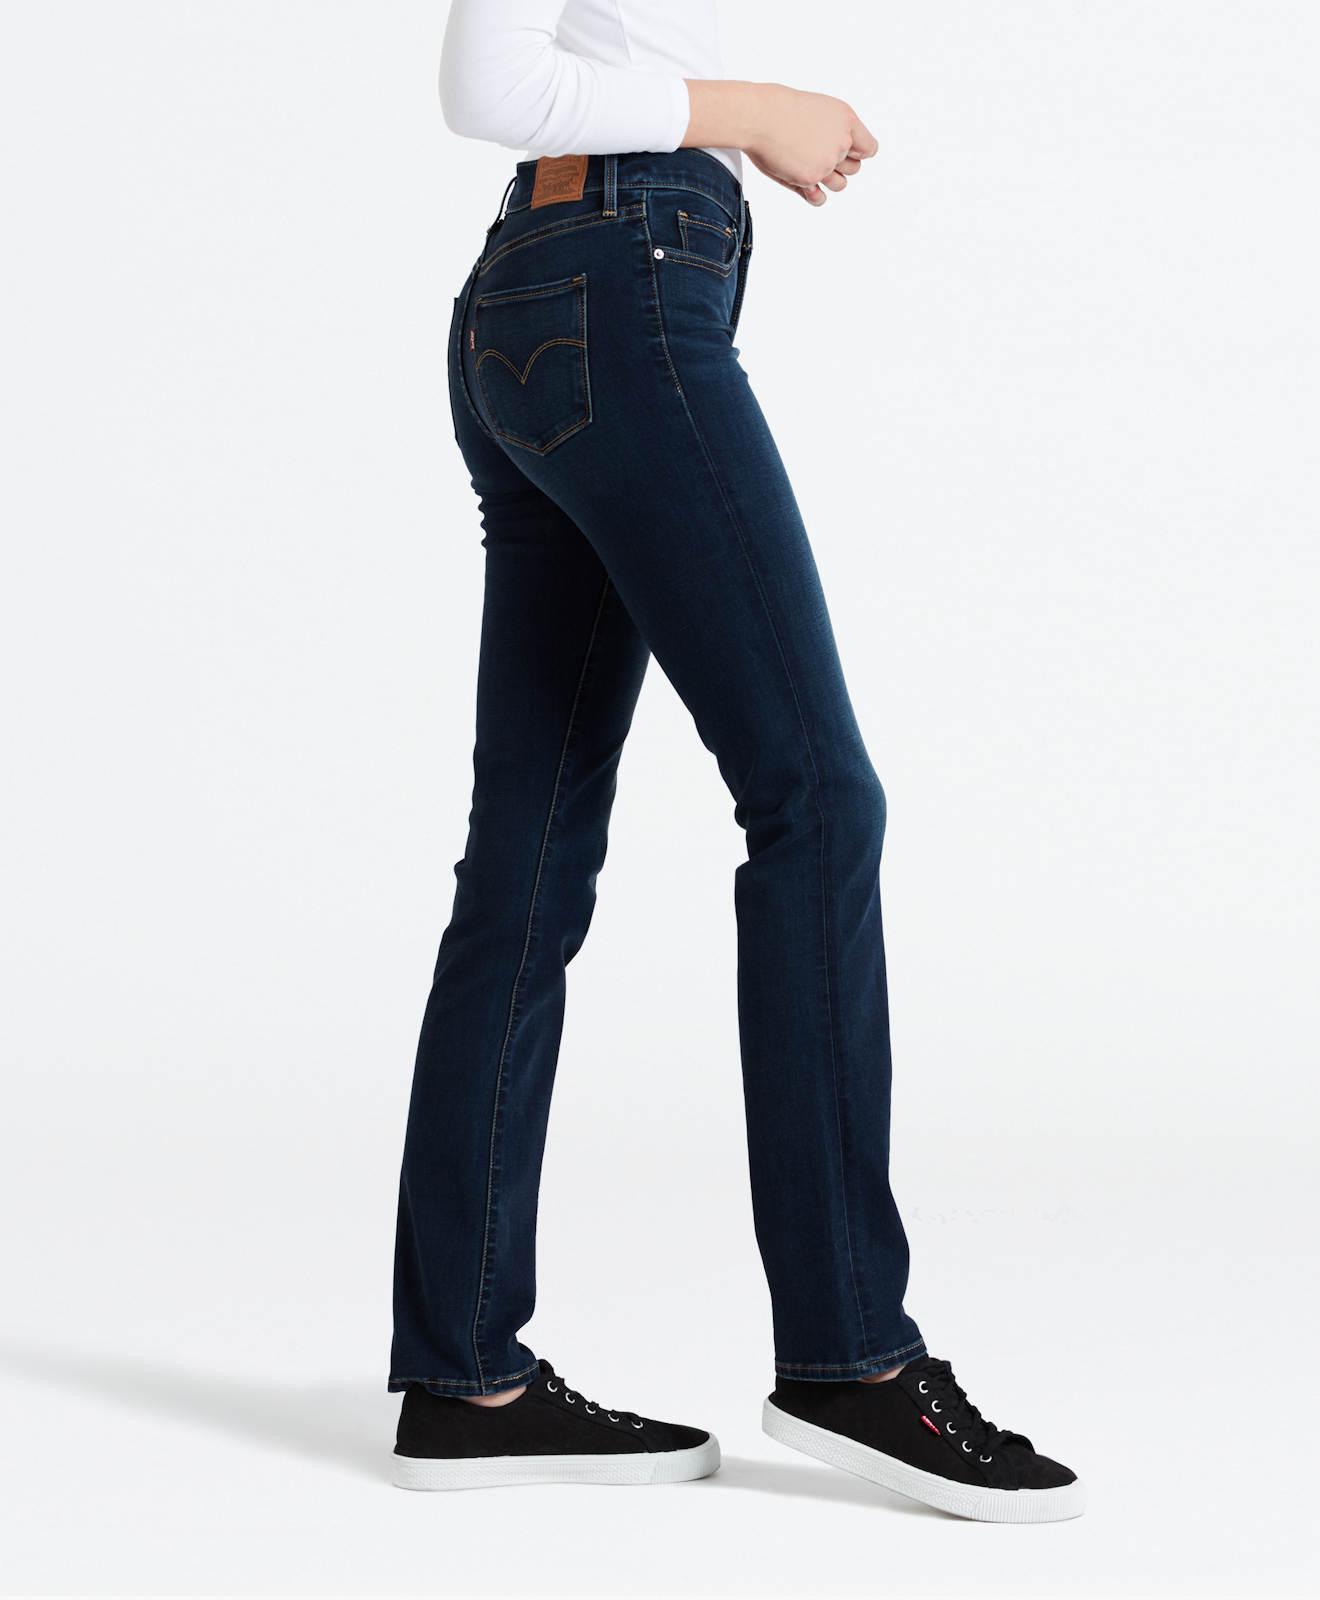 Hose Slim Shaping Hüfthose ® Date Destiny Denim 312 Jeans Neu Levi's with Damen gw0tSxqS8